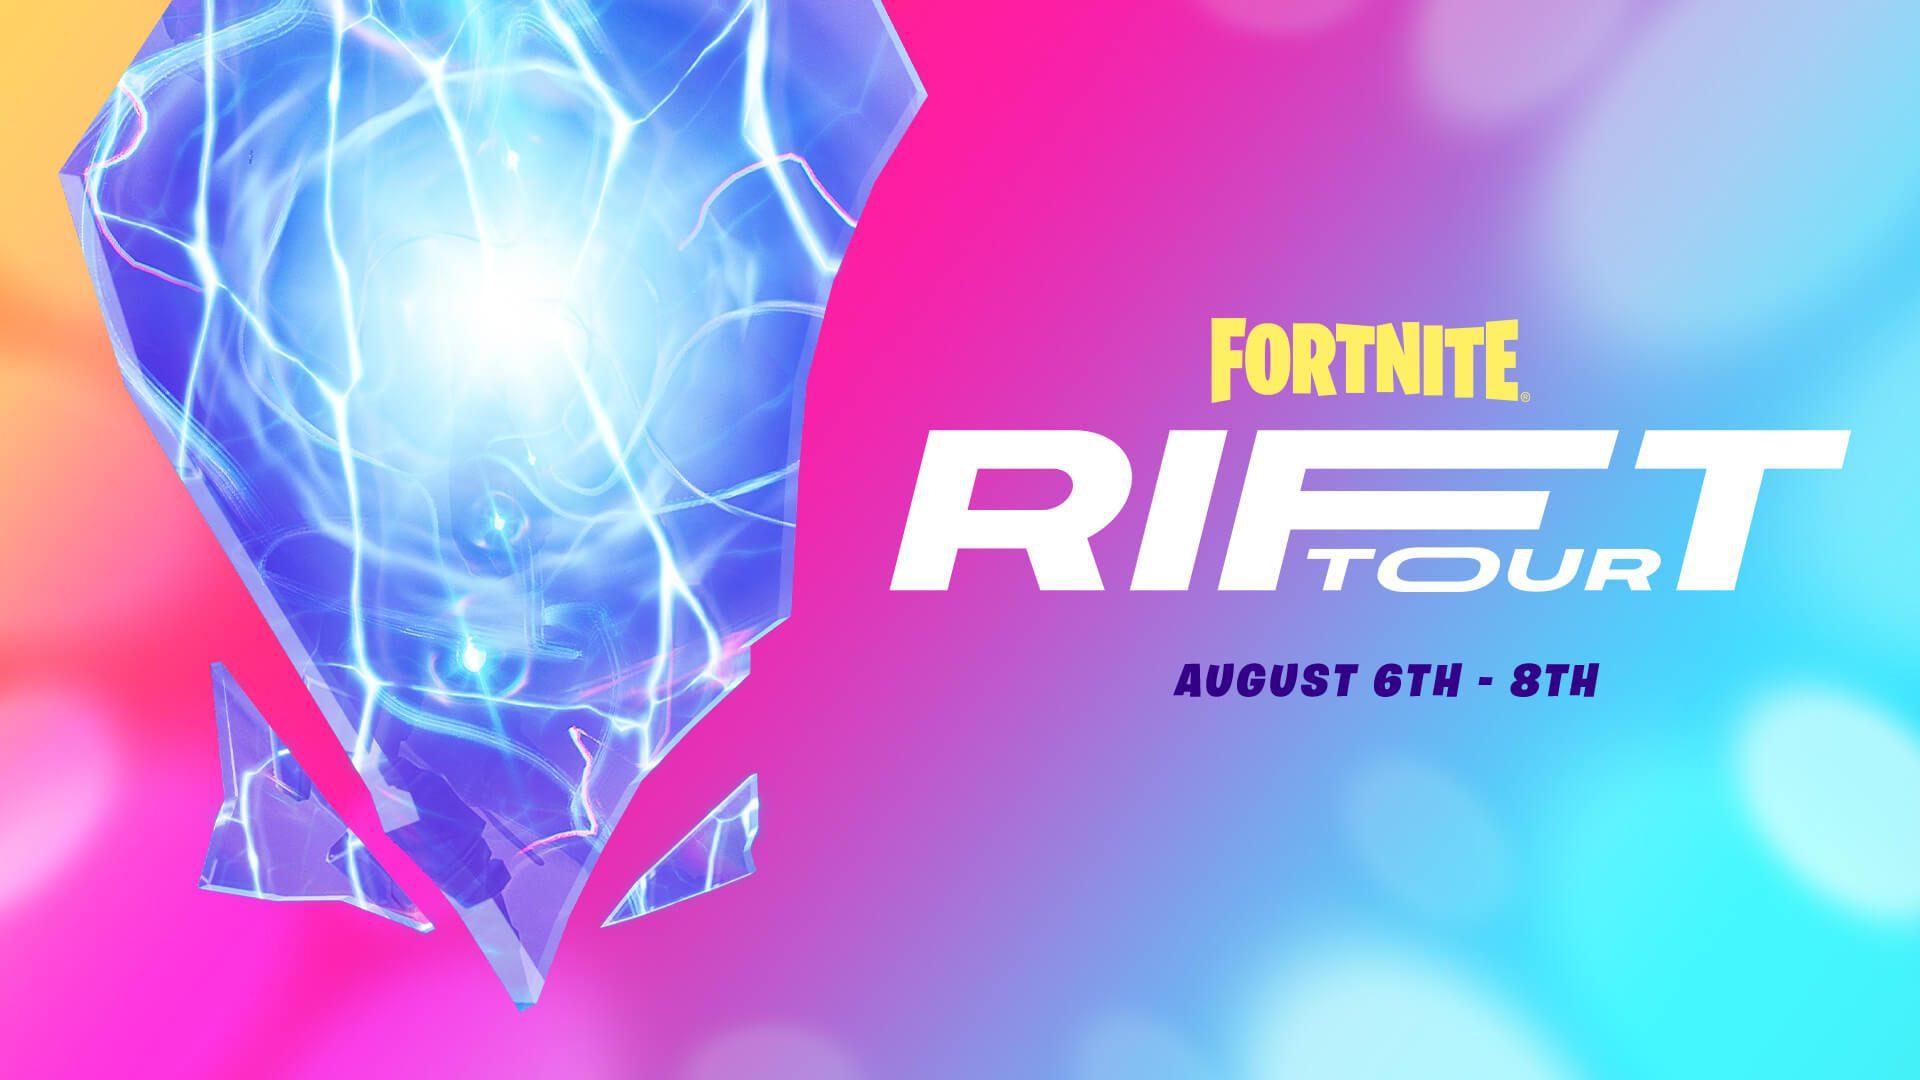 Fortnite Rift Tour Event wordt samenwerking met artiest